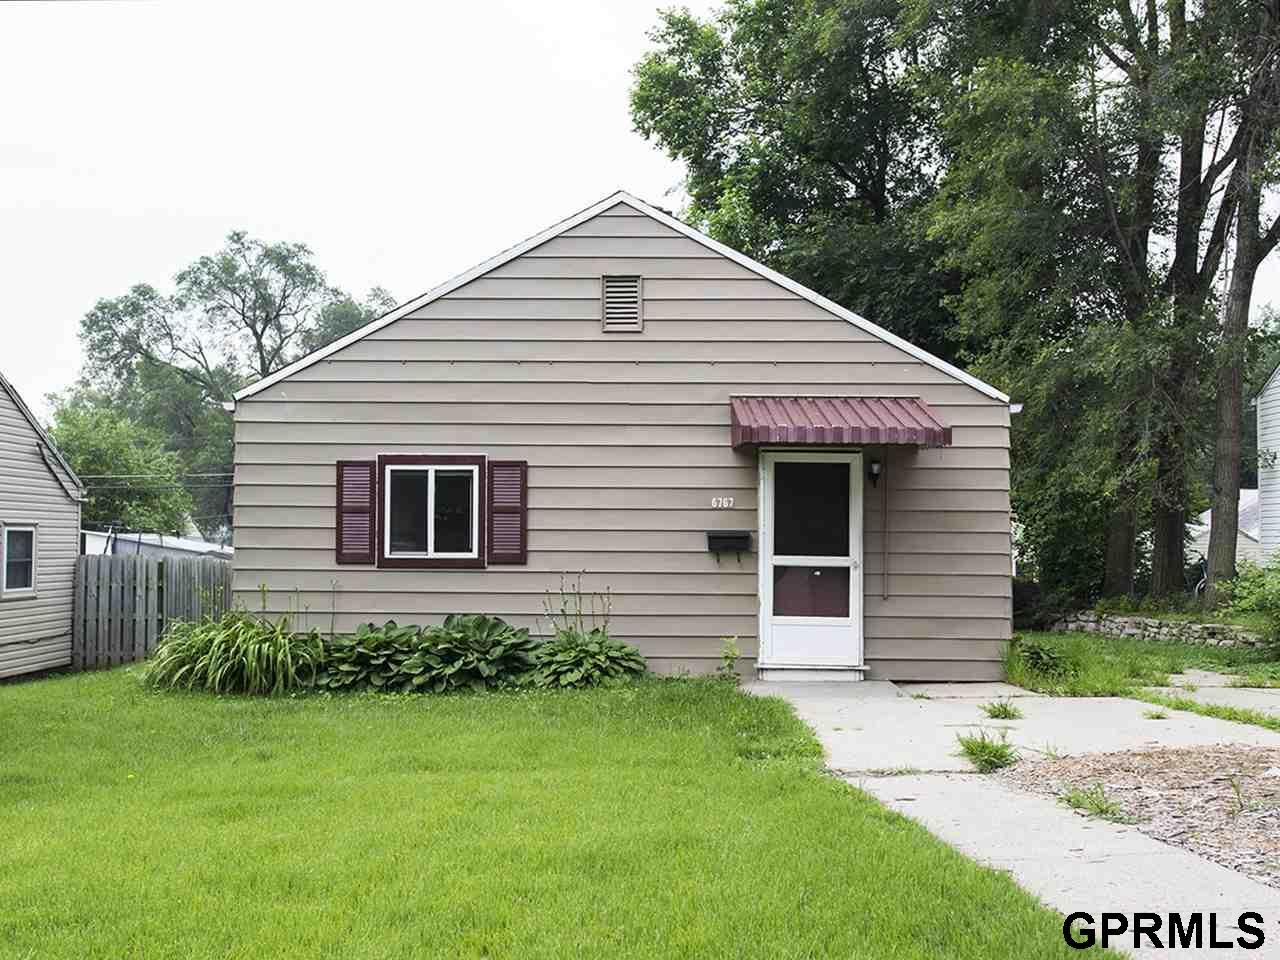 Rental Homes for Rent, ListingId:36932756, location: 6767 Charles Omaha 68132